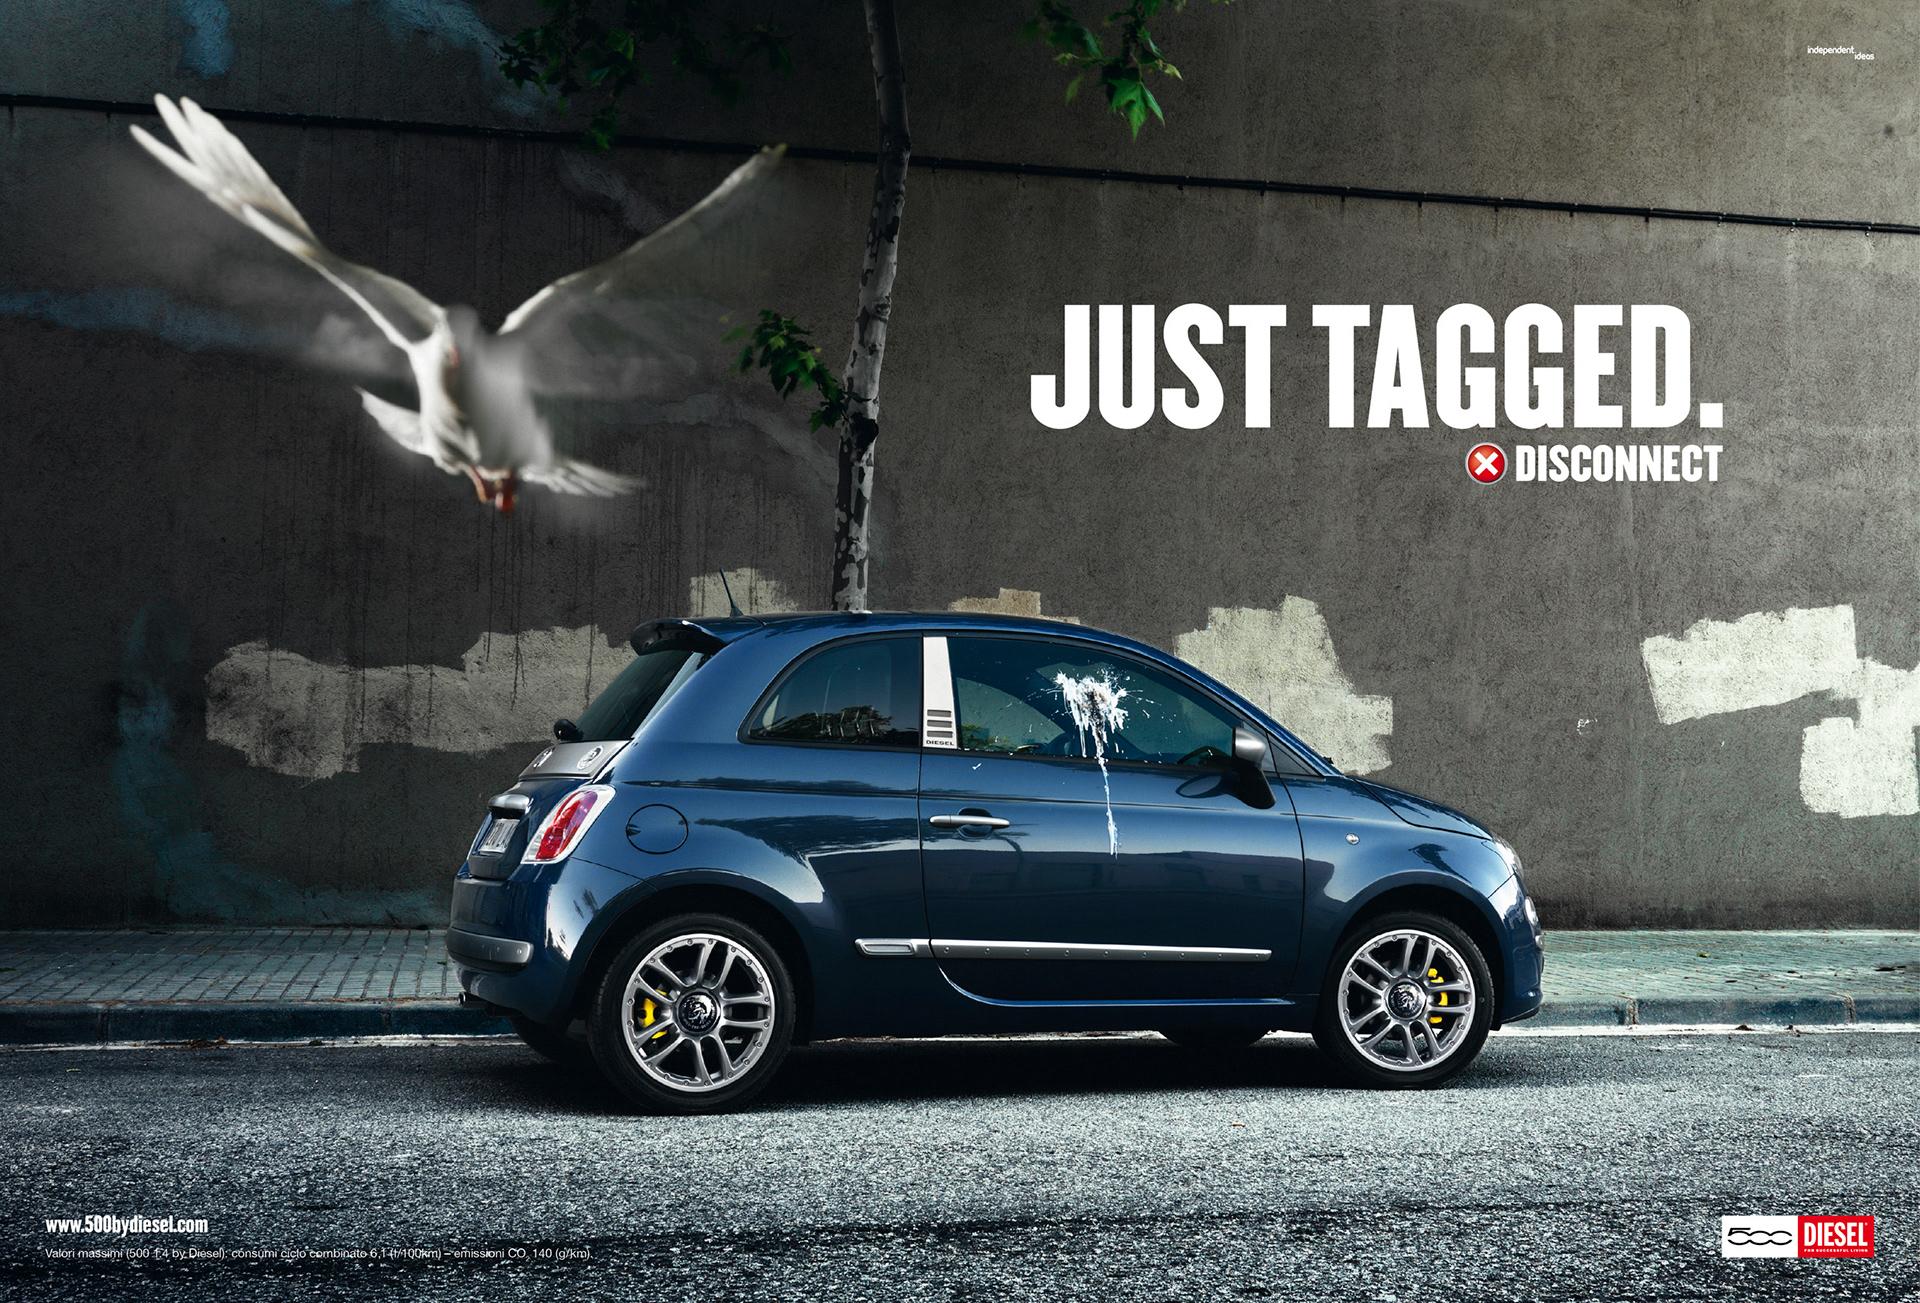 Pierfabio Iannuzzi FIAT DIESEL - Fiat 500 website